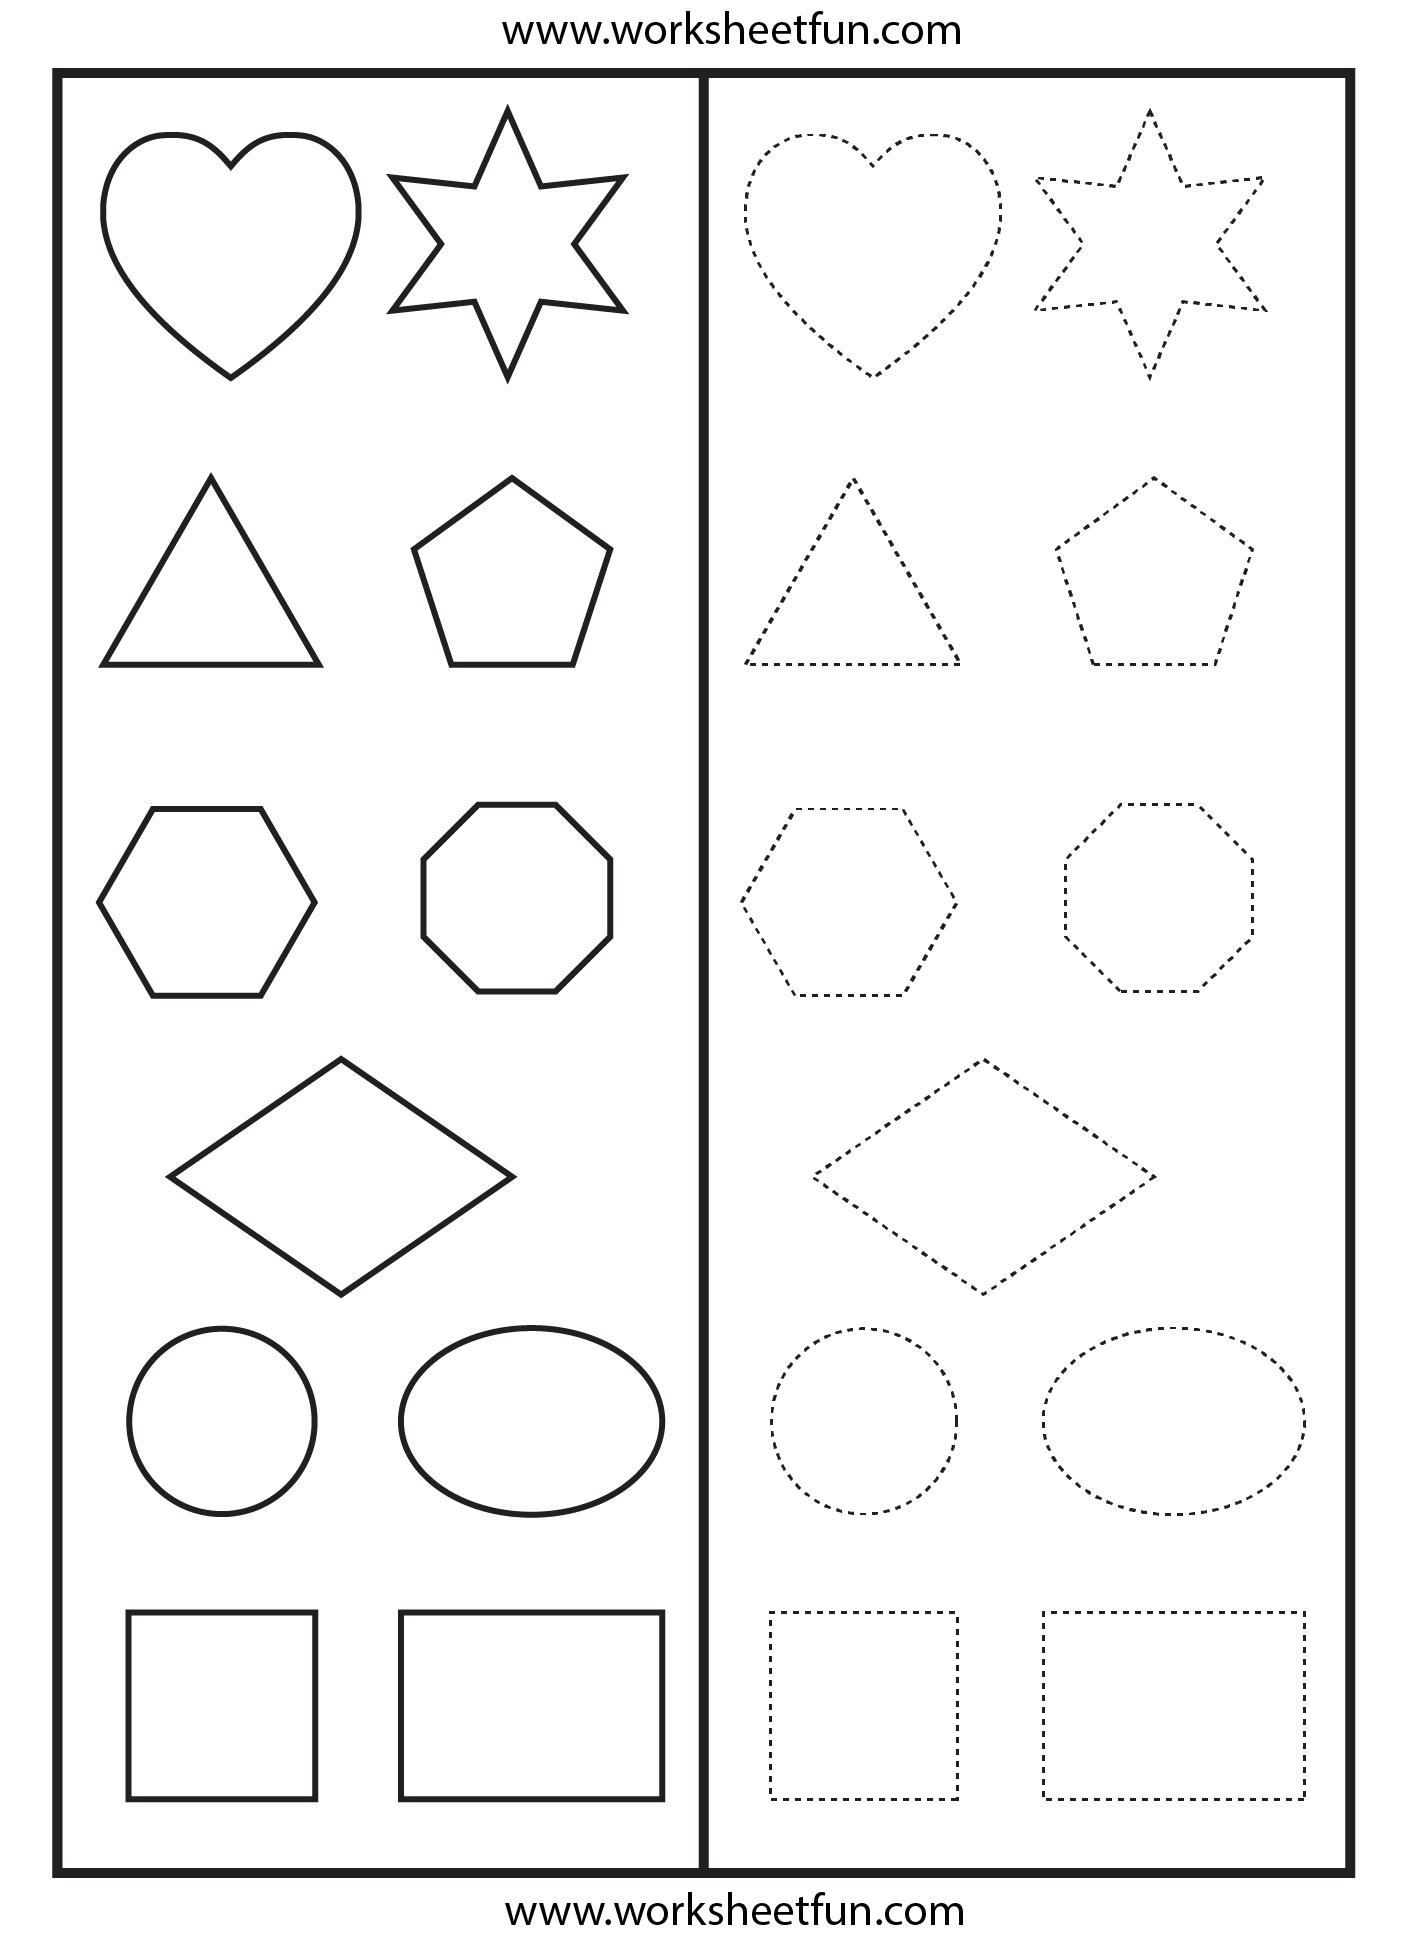 Shapes Wfun Tracing1 1 405 1 954 Pixels